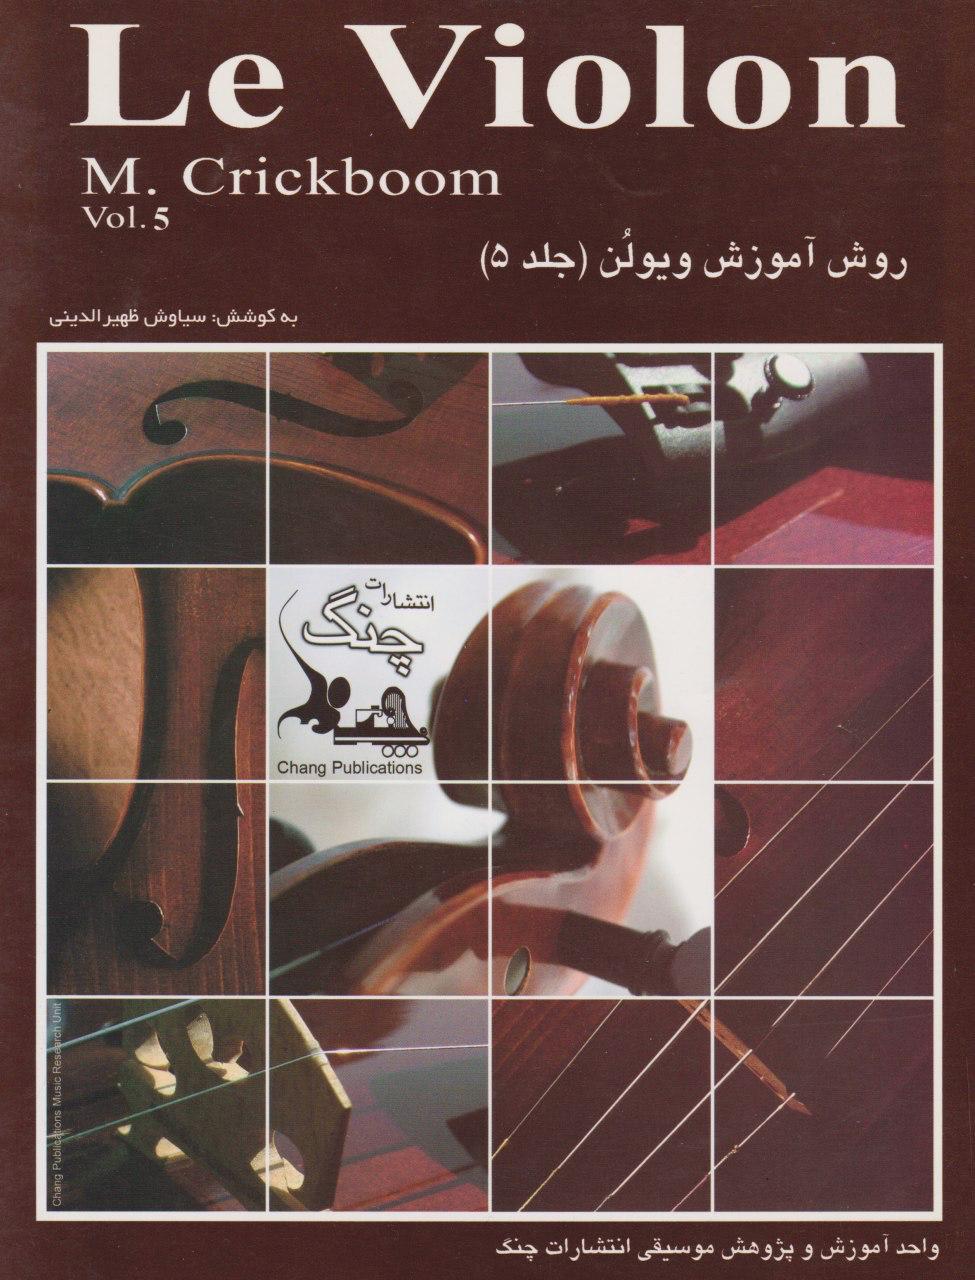 کتاب پنجم لویولن Le Violon انتشارات چنگ